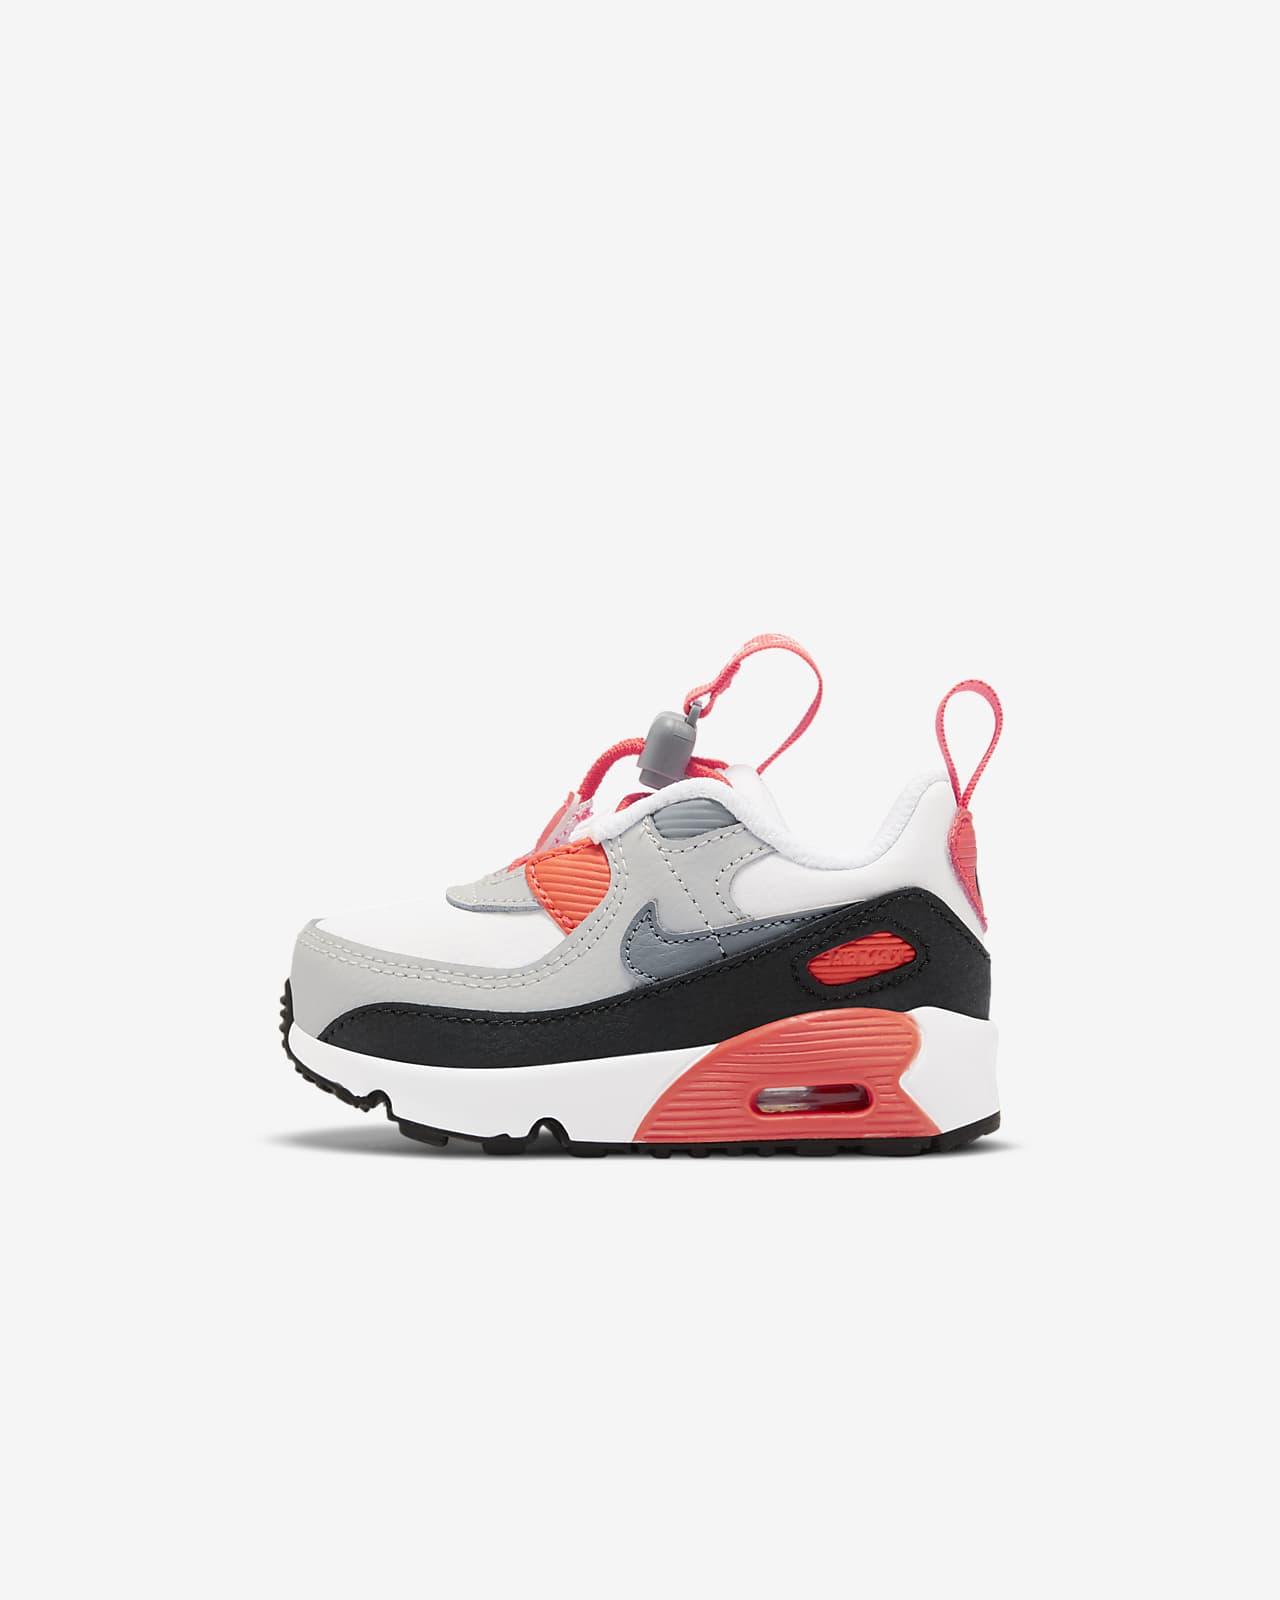 Nike Air Max 90 Toggle Baby/Toddler Shoes